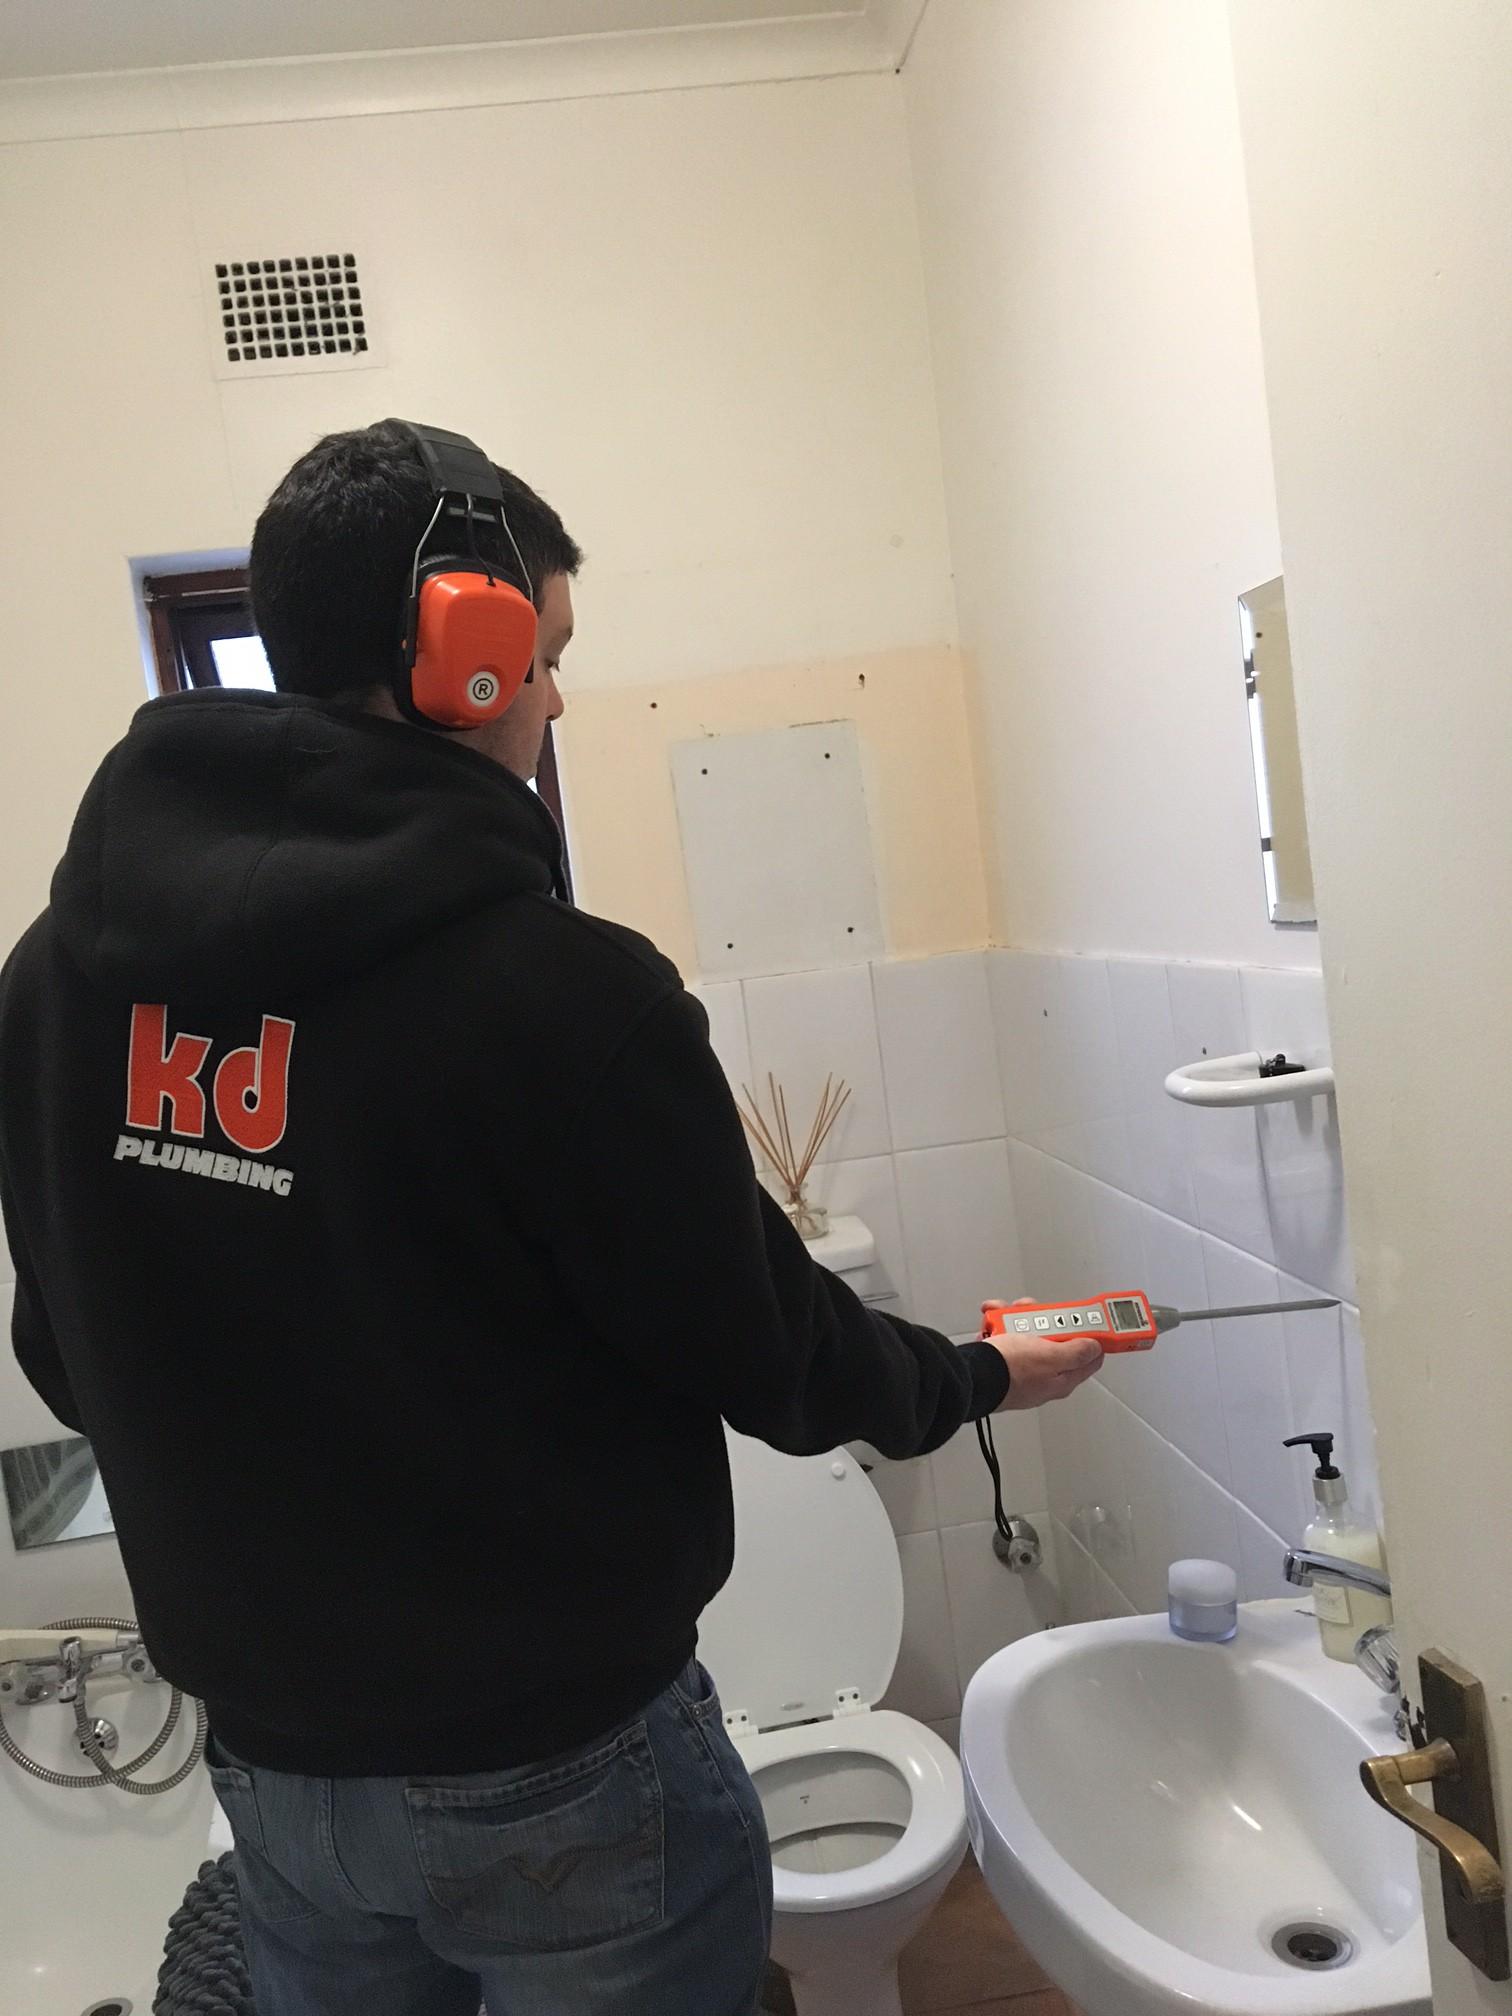 Leak Detection KD Plumbing - Bathroom leak detection